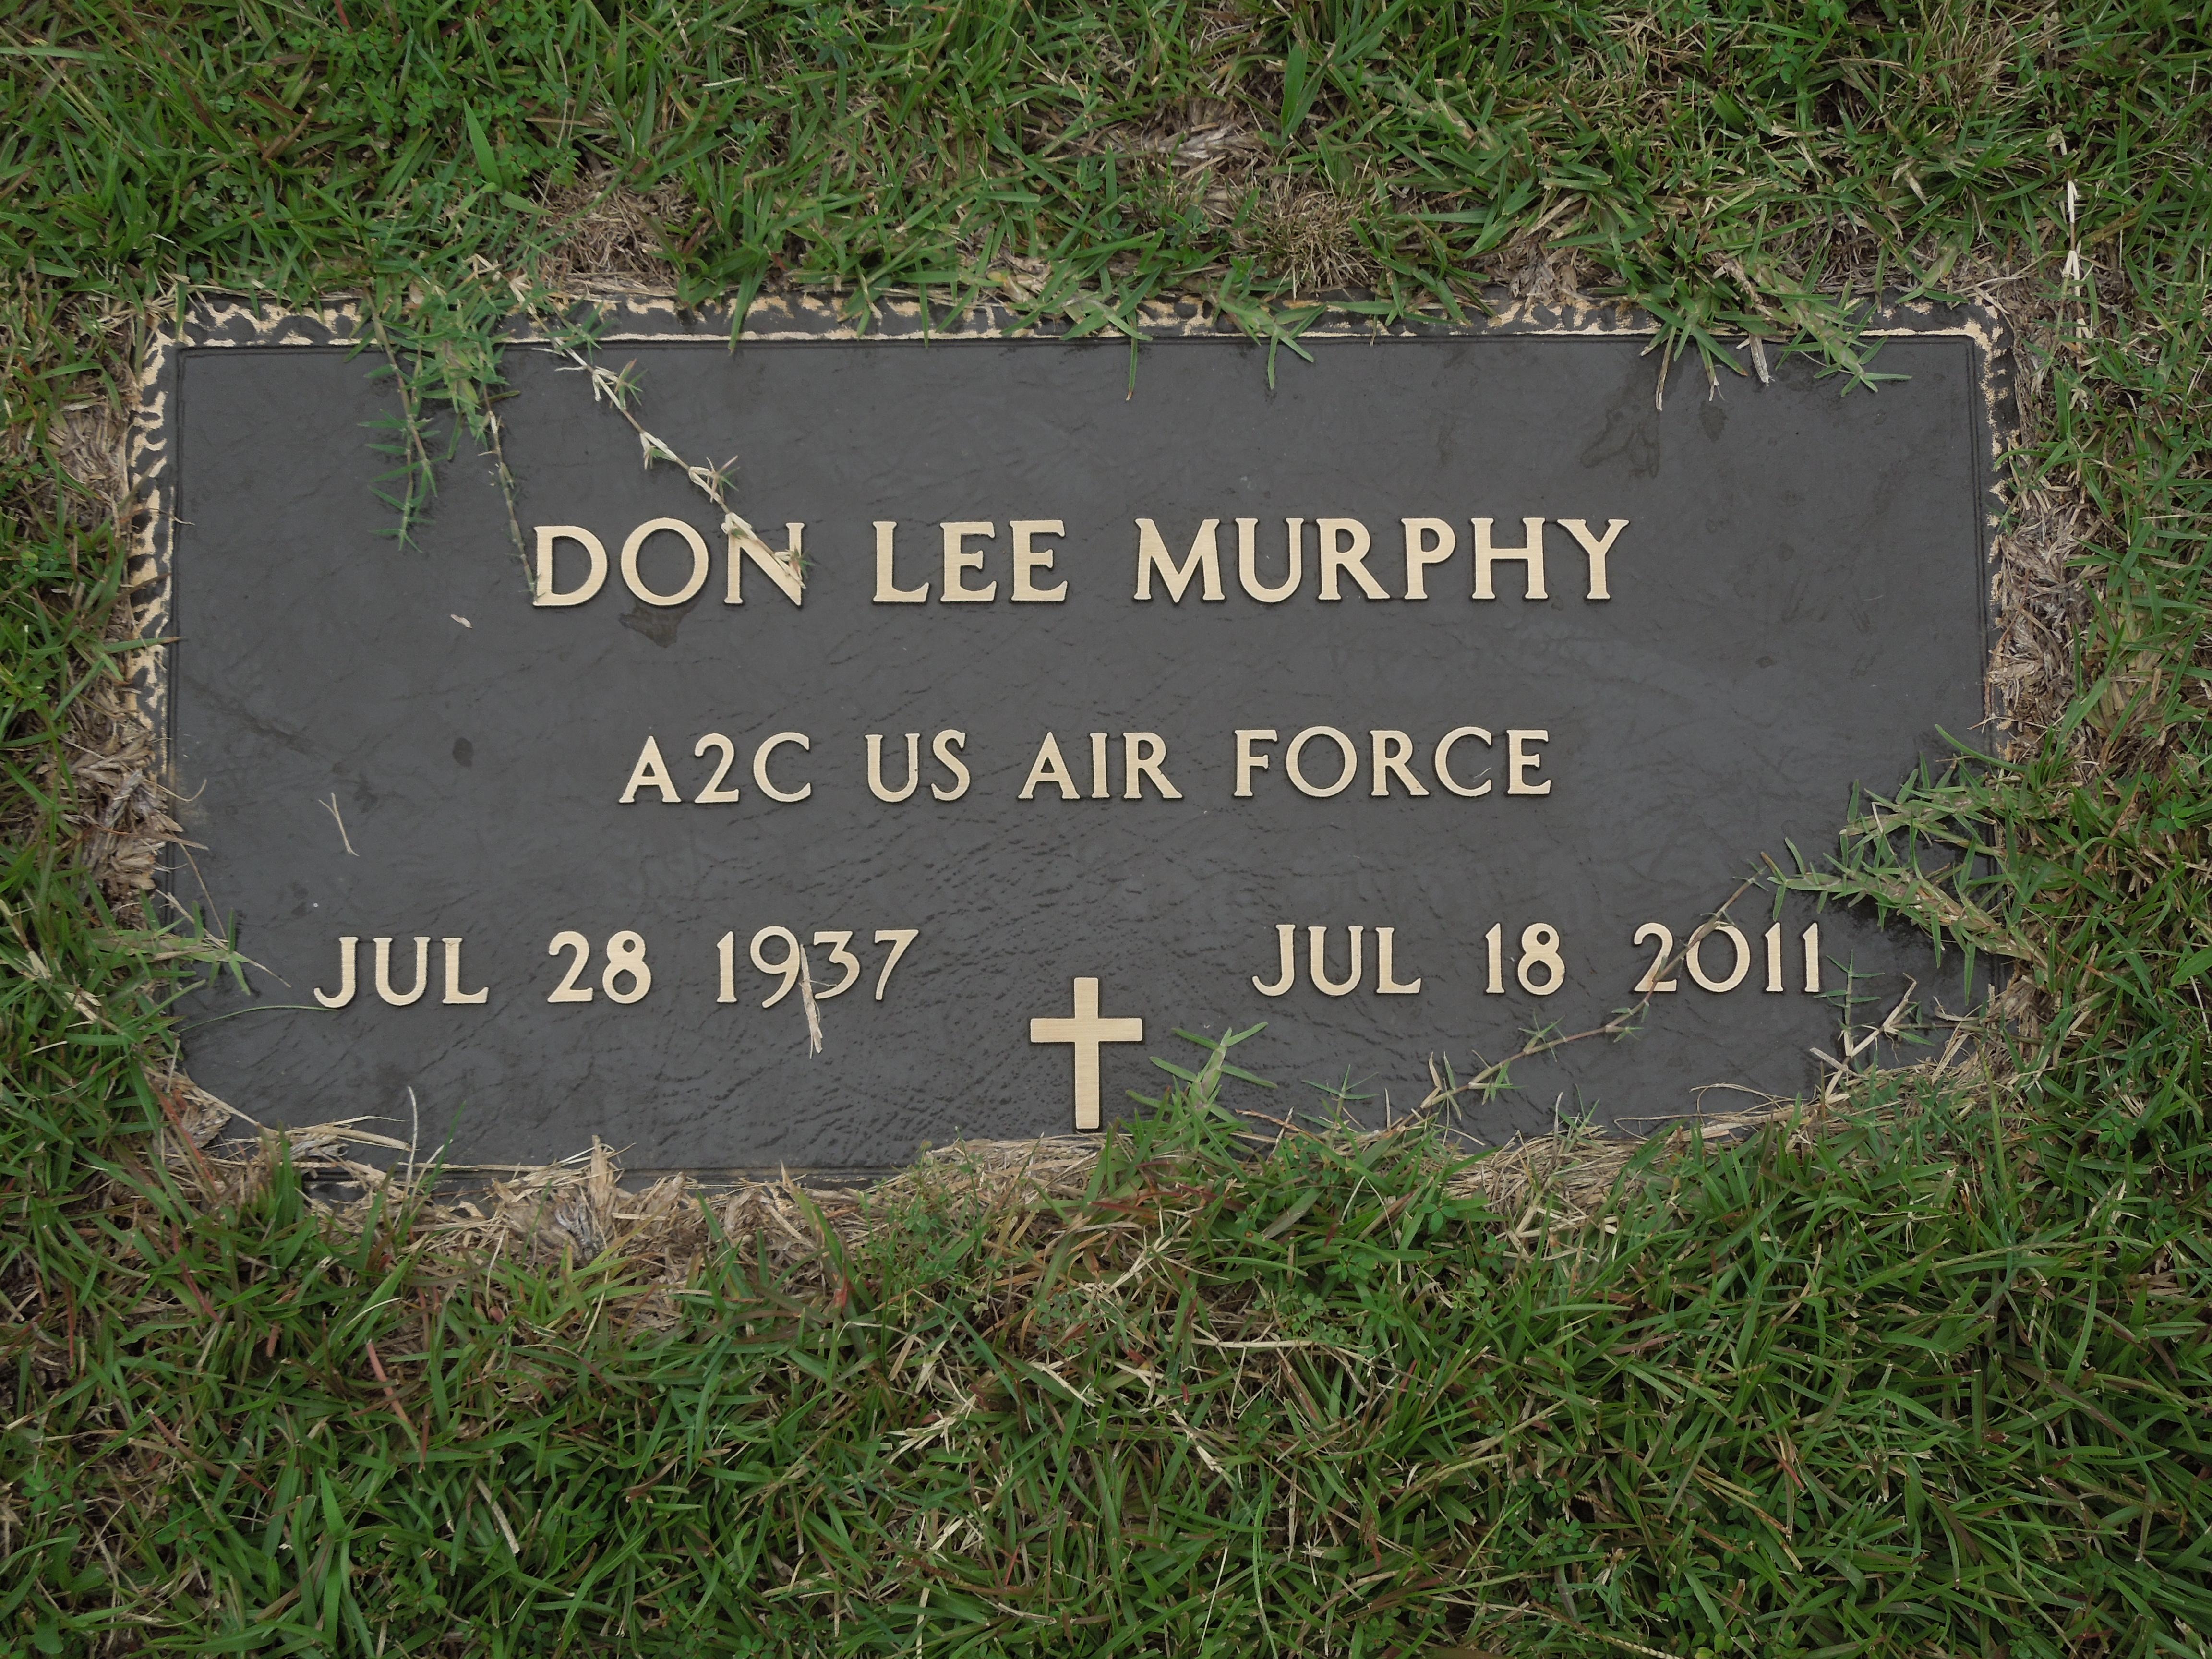 Don Lee Murphy